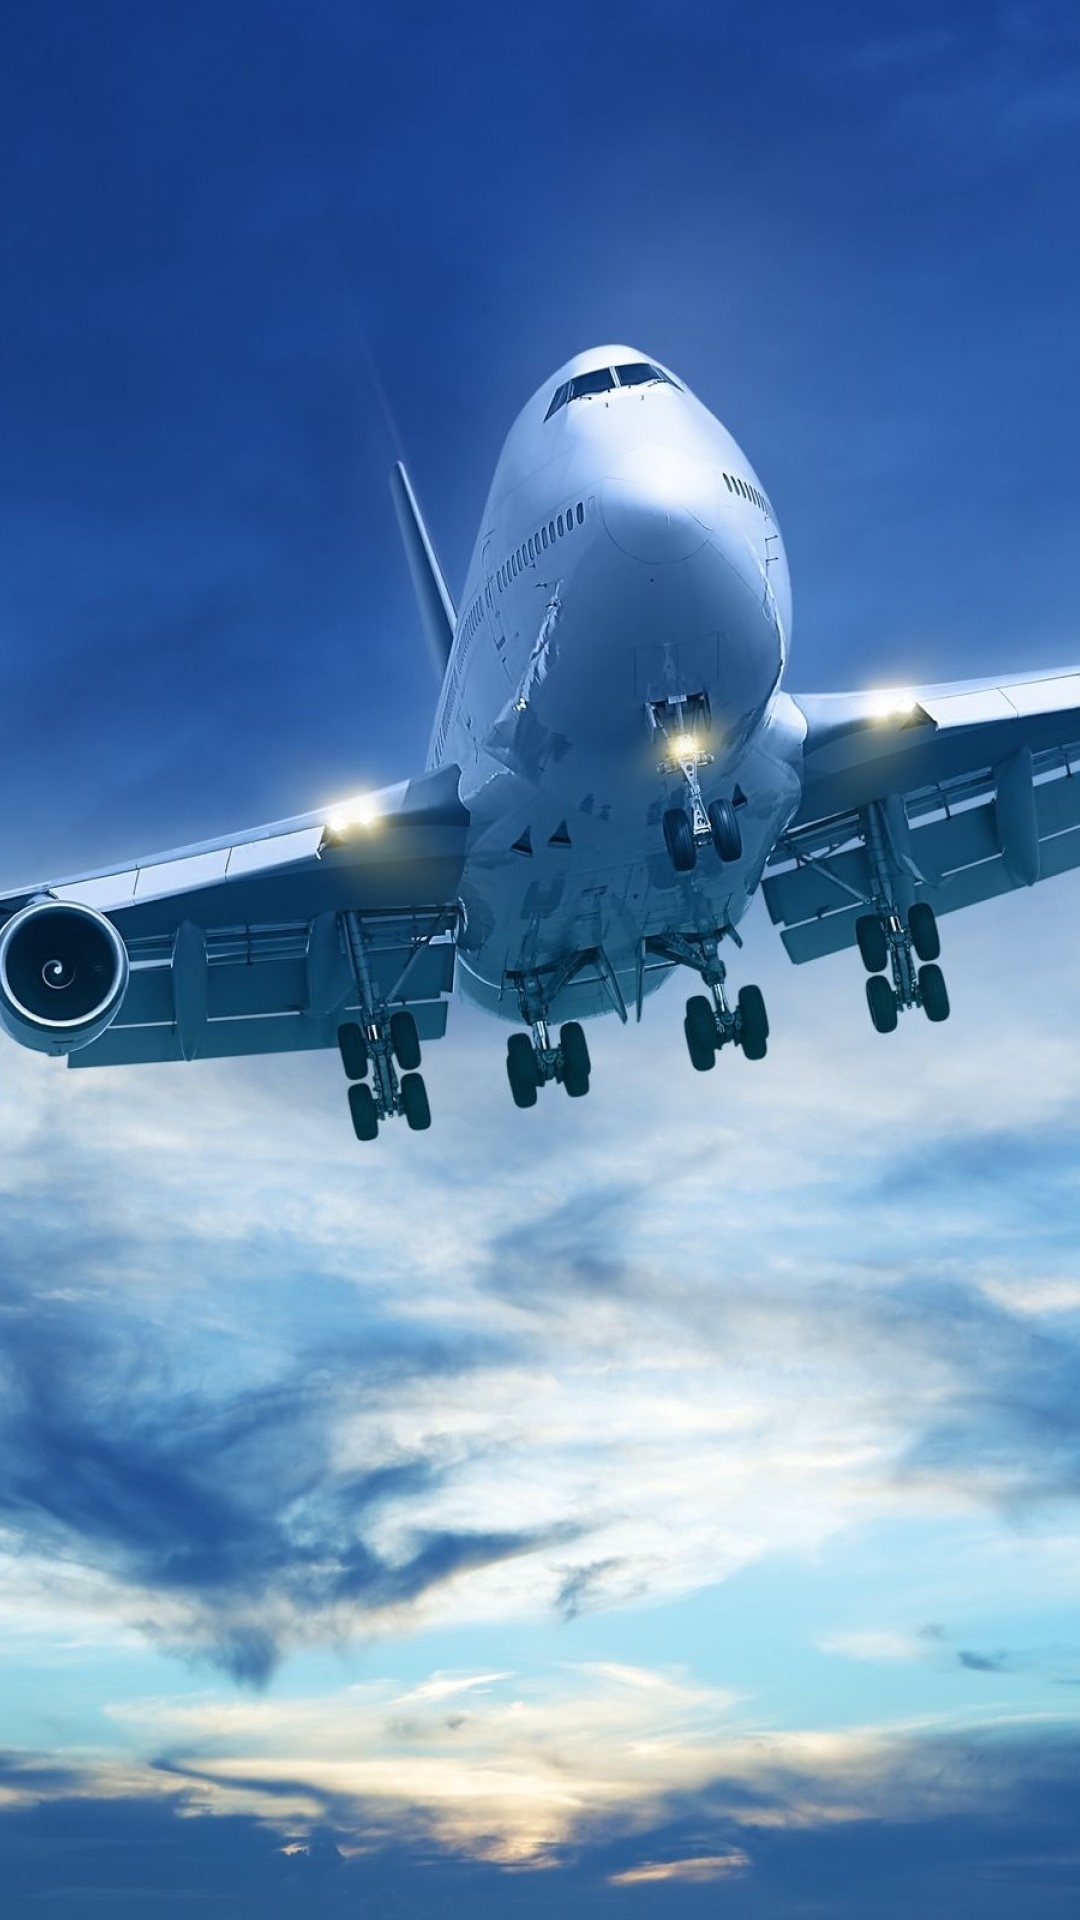 Hd Airplane Iphone Background Pixelstalk Net